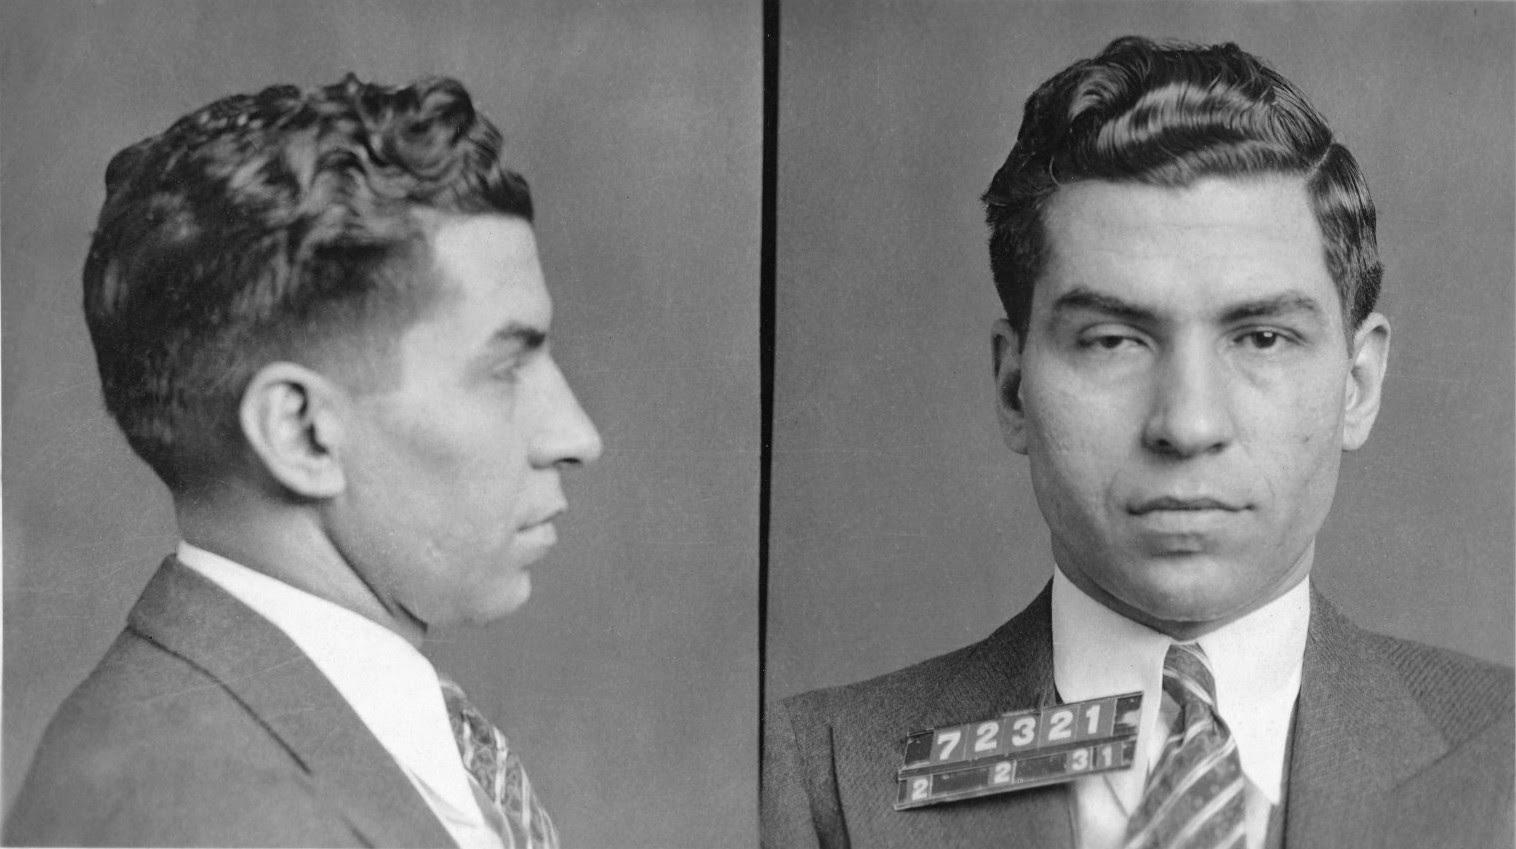 http://upload.wikimedia.org/wikipedia/commons/8/82/Lucky_Luciano_mugshot_1931.jpg